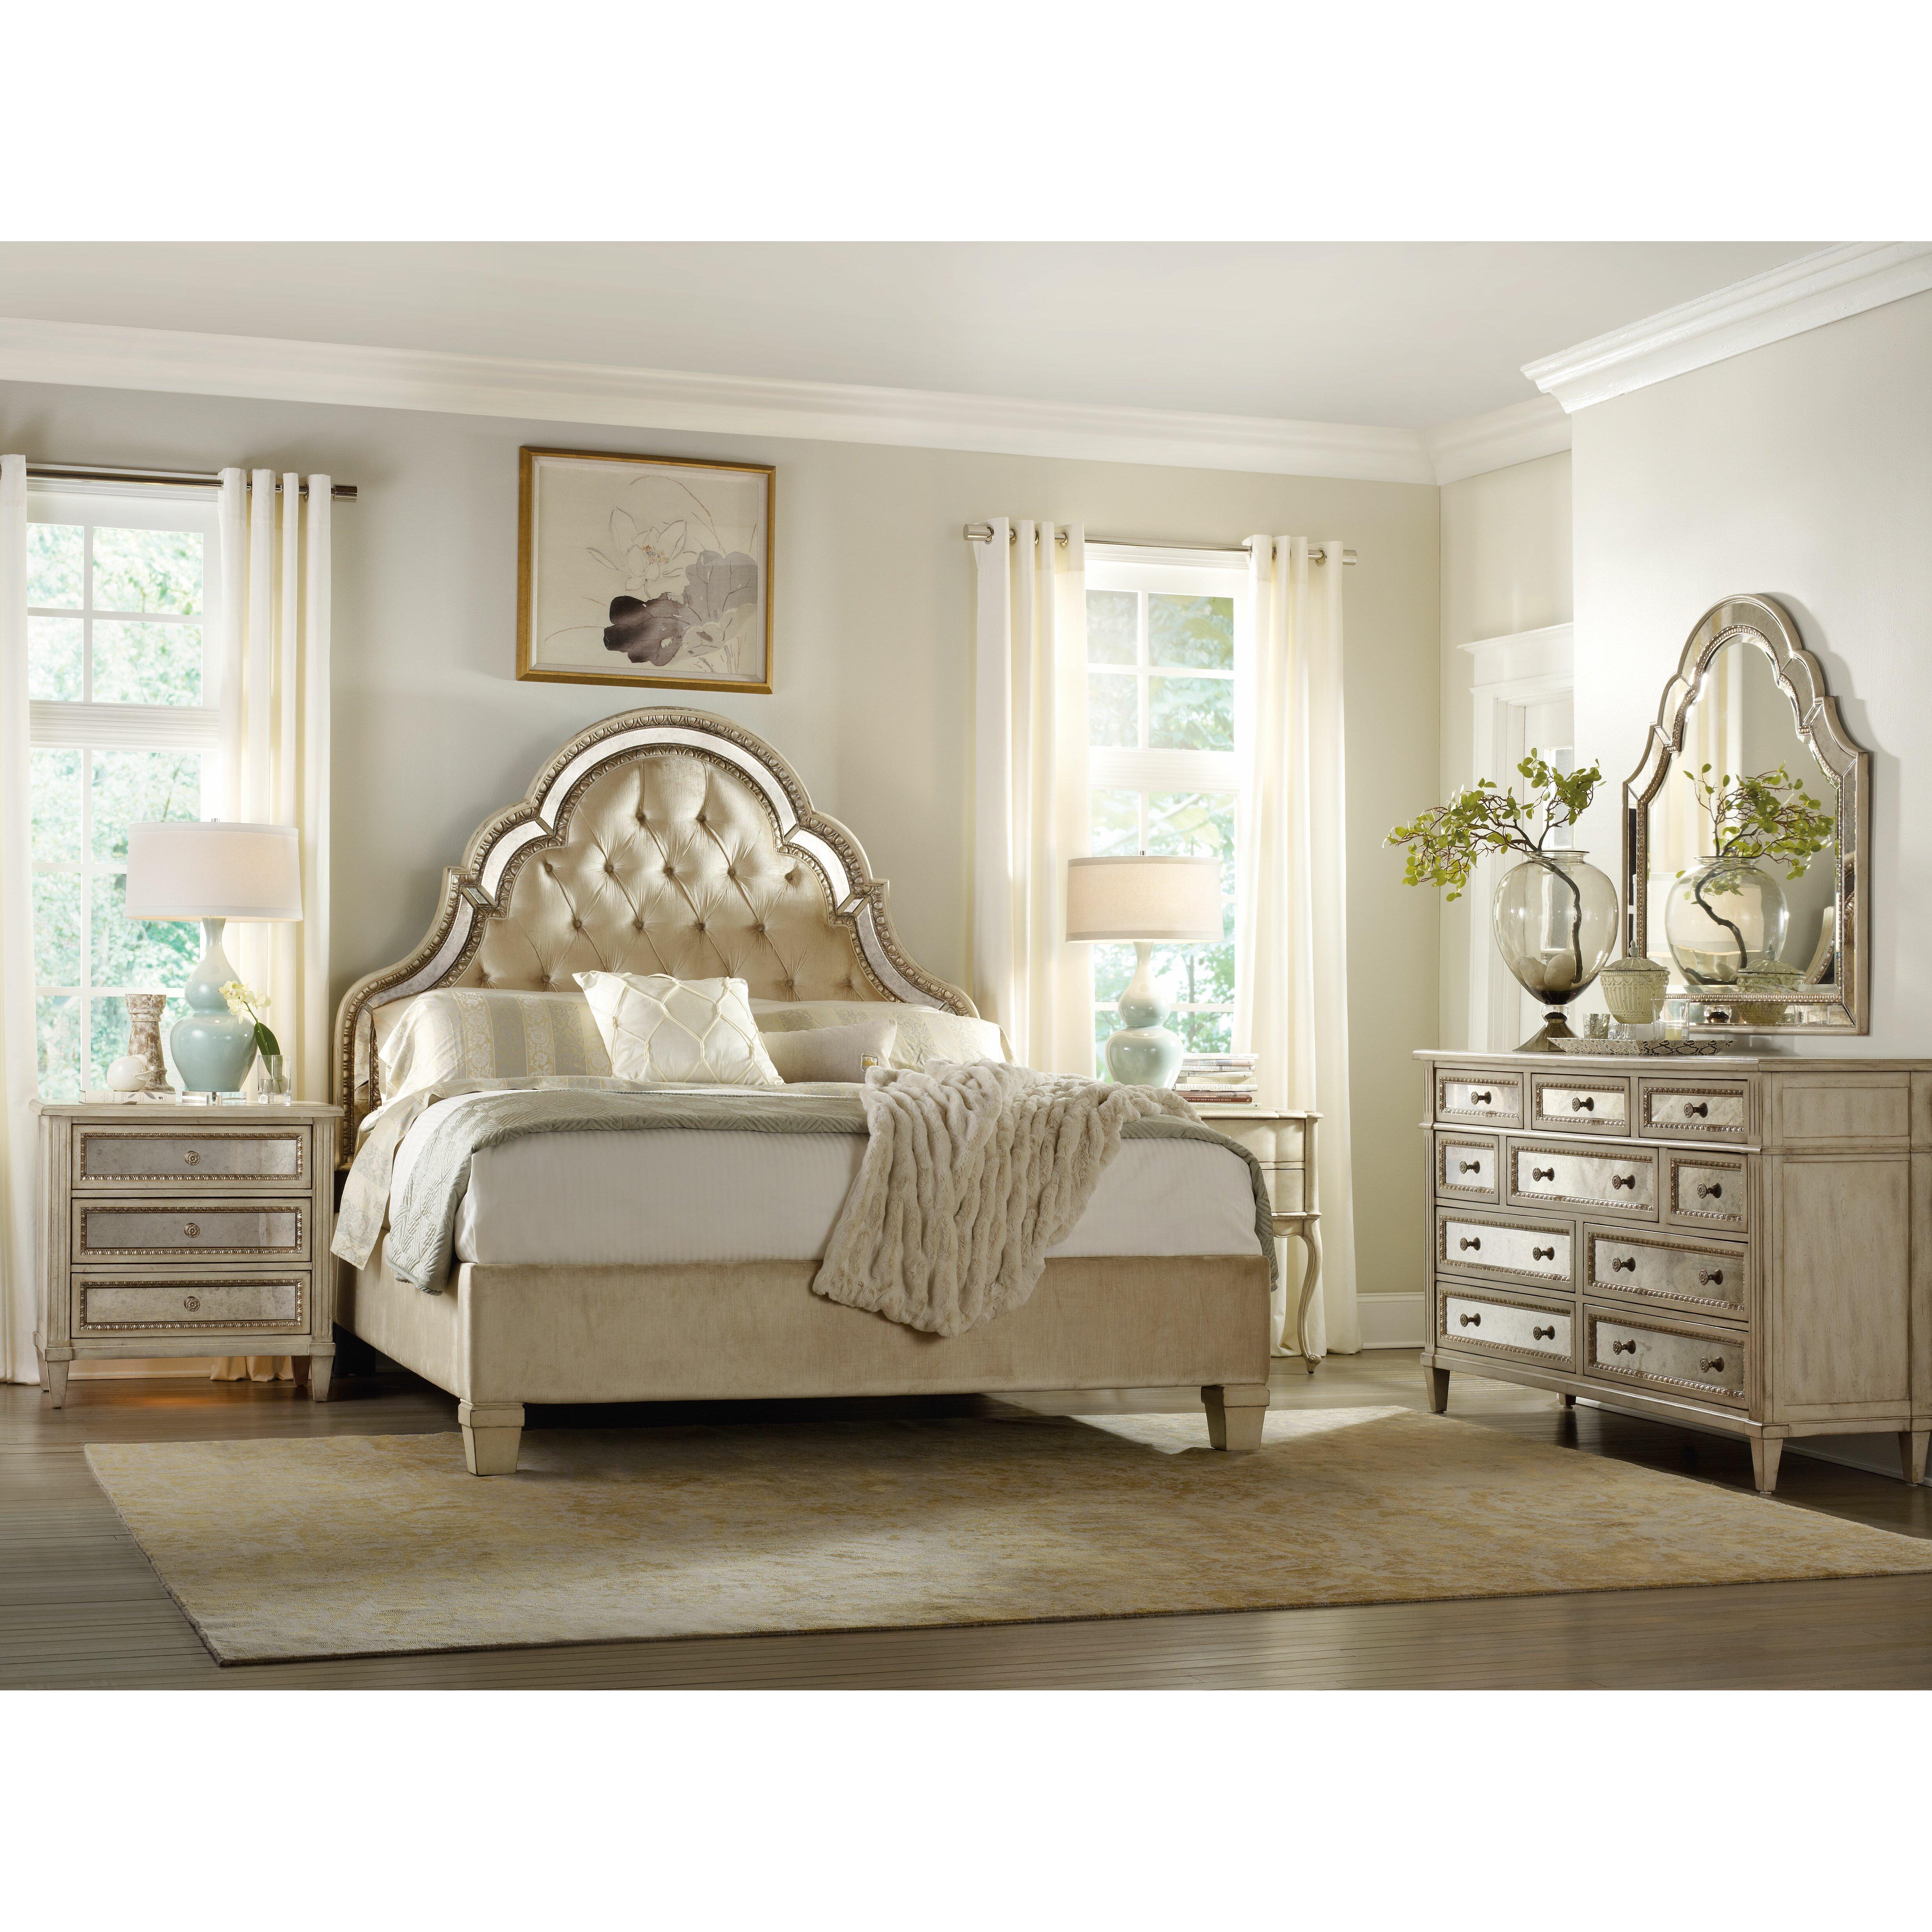 Hooker Furniture Sanctuary 3 Drawer Bachelor's Chest